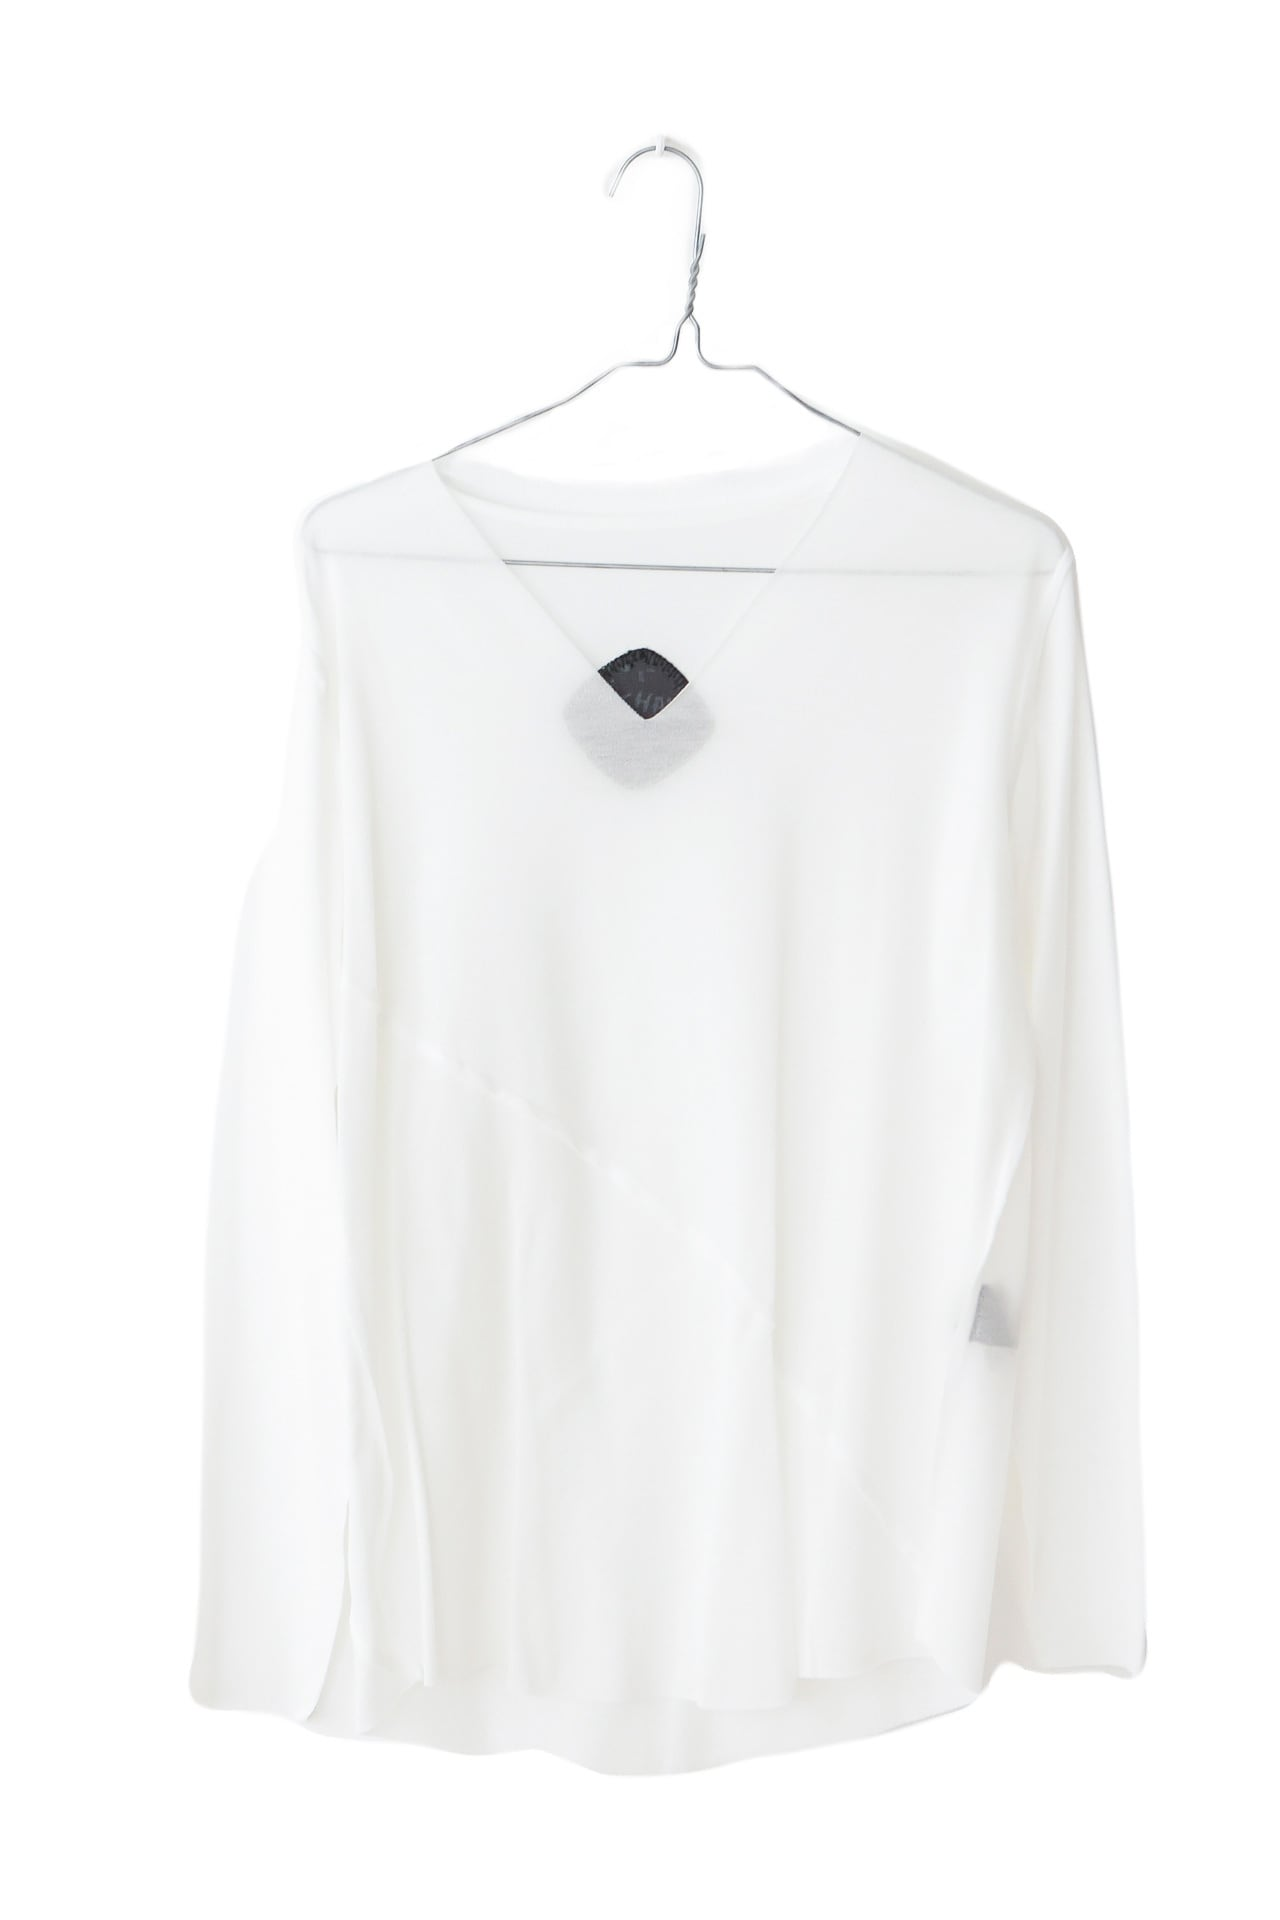 Tshirt【COTTON コットン】WHITE CS1904[税/送料込][受注生産]